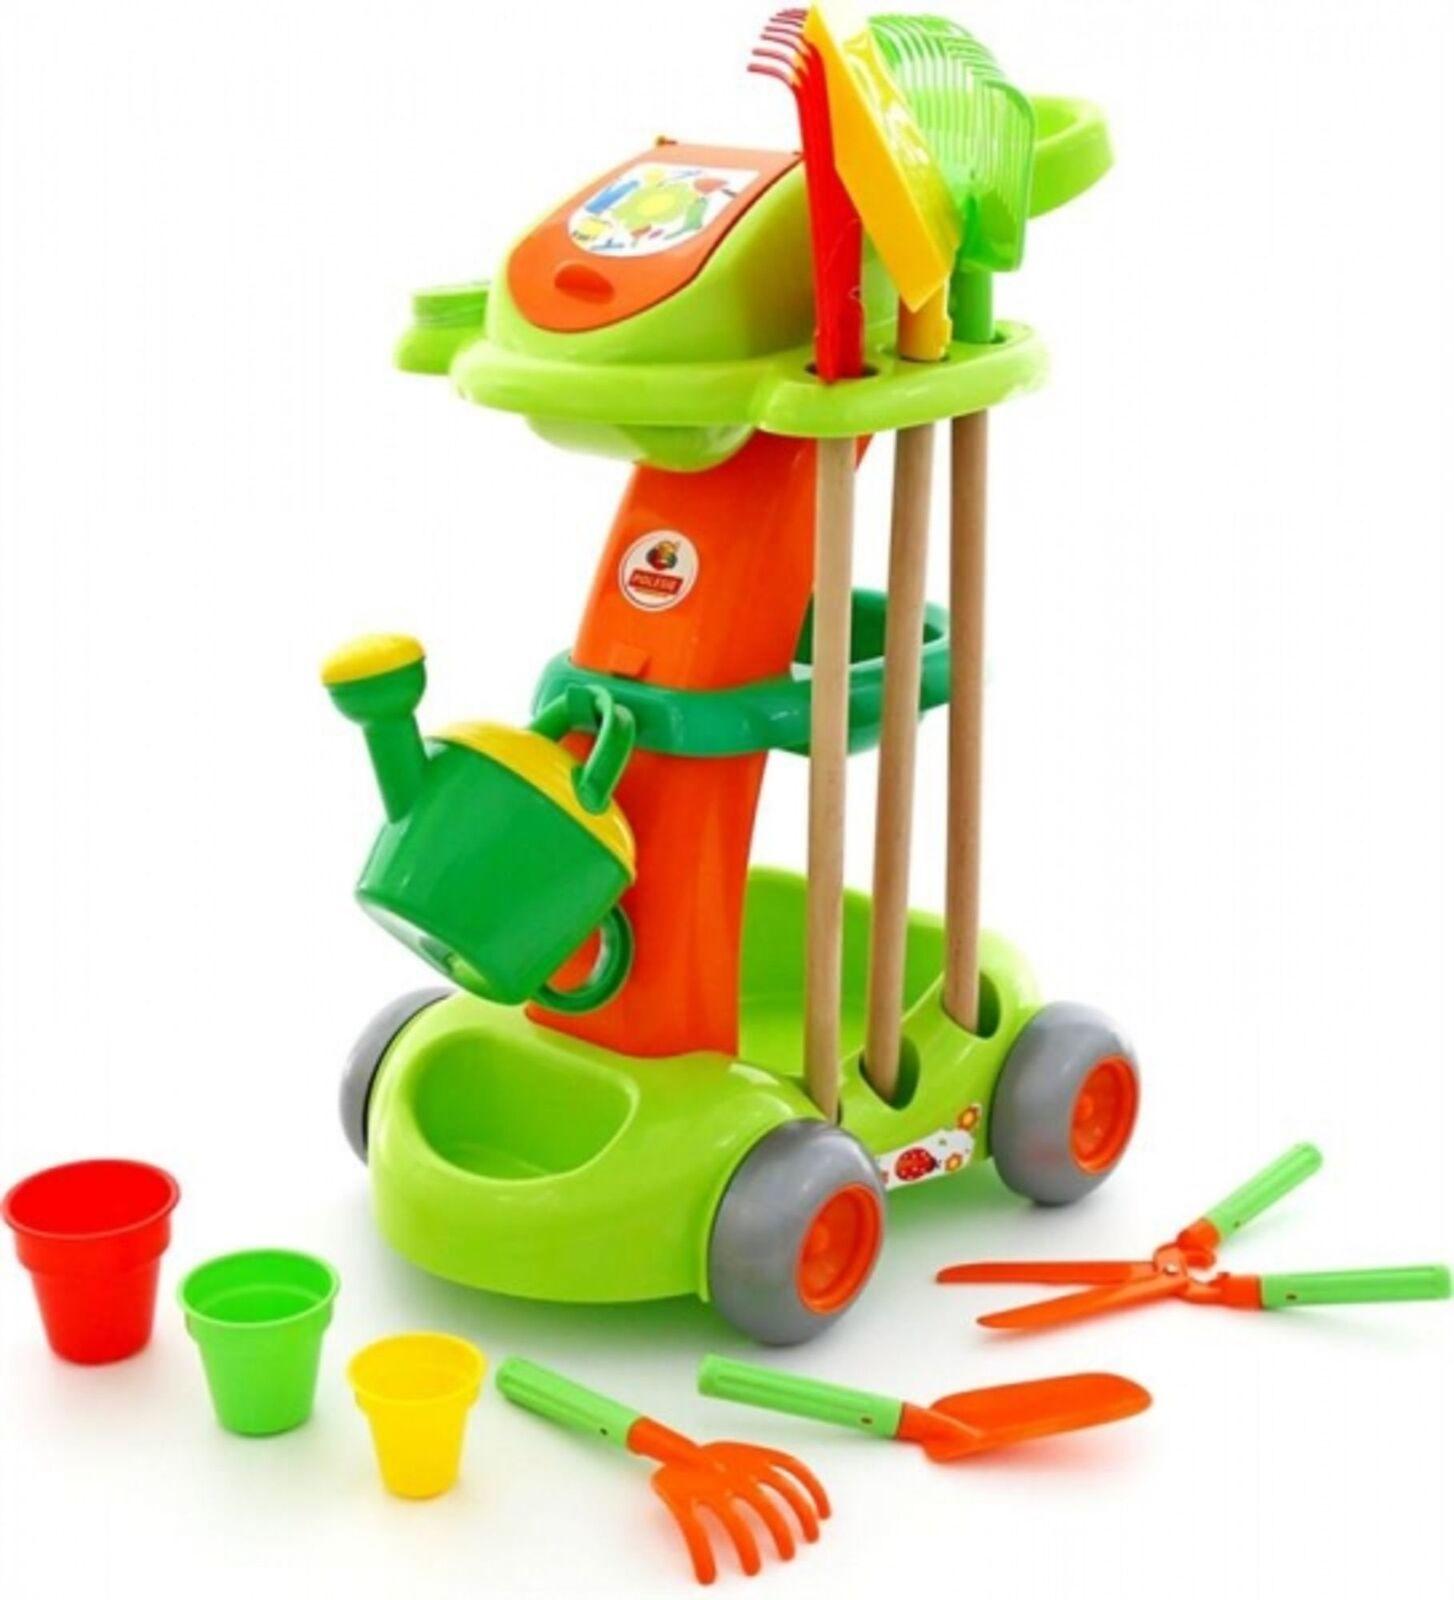 WADER 54548 Gartencaddie 11-tlg. 11-tlg. 11-tlg. Kinderspielzeug Harke Schaufel Gießkanne NEU  | Rabatt  95aed6